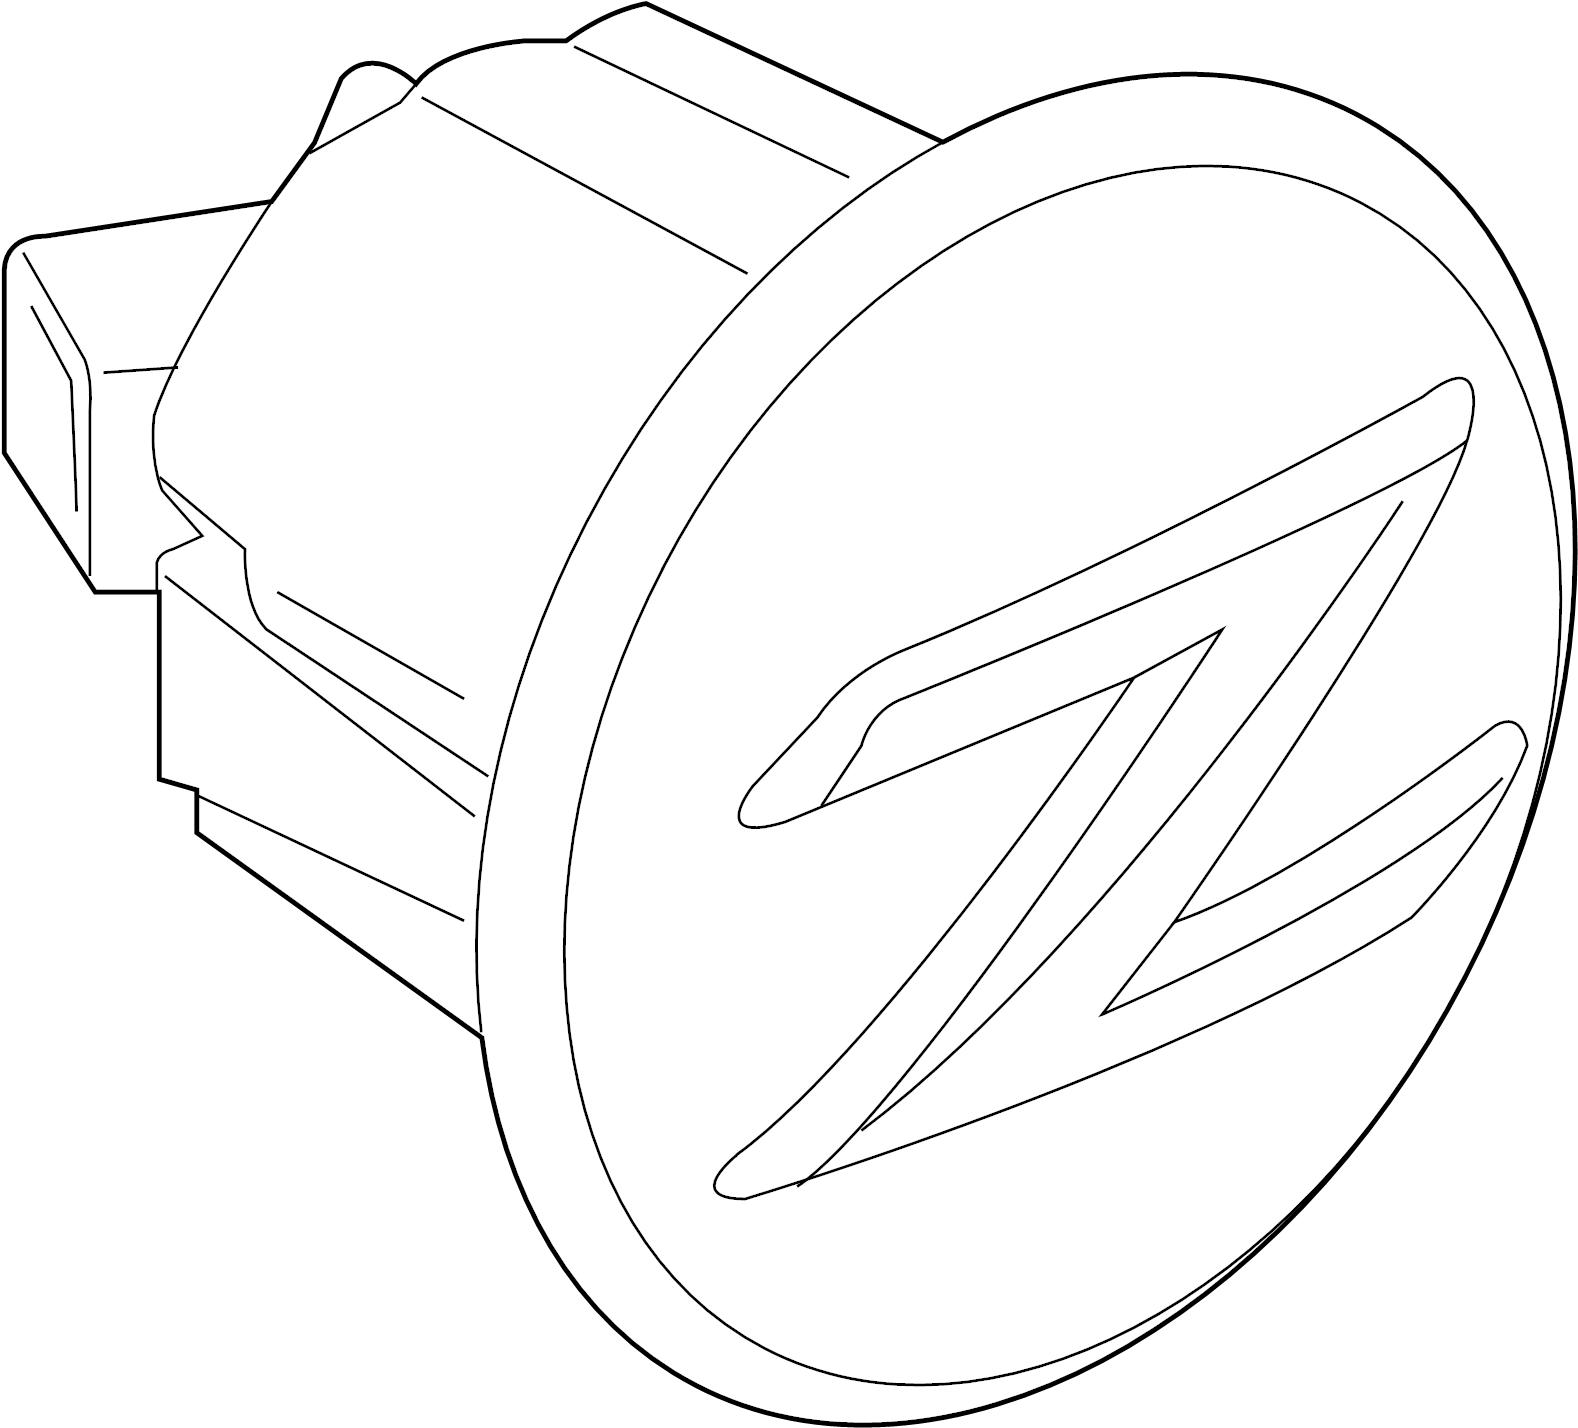 Nissan 370z Turn Signal Light Lens